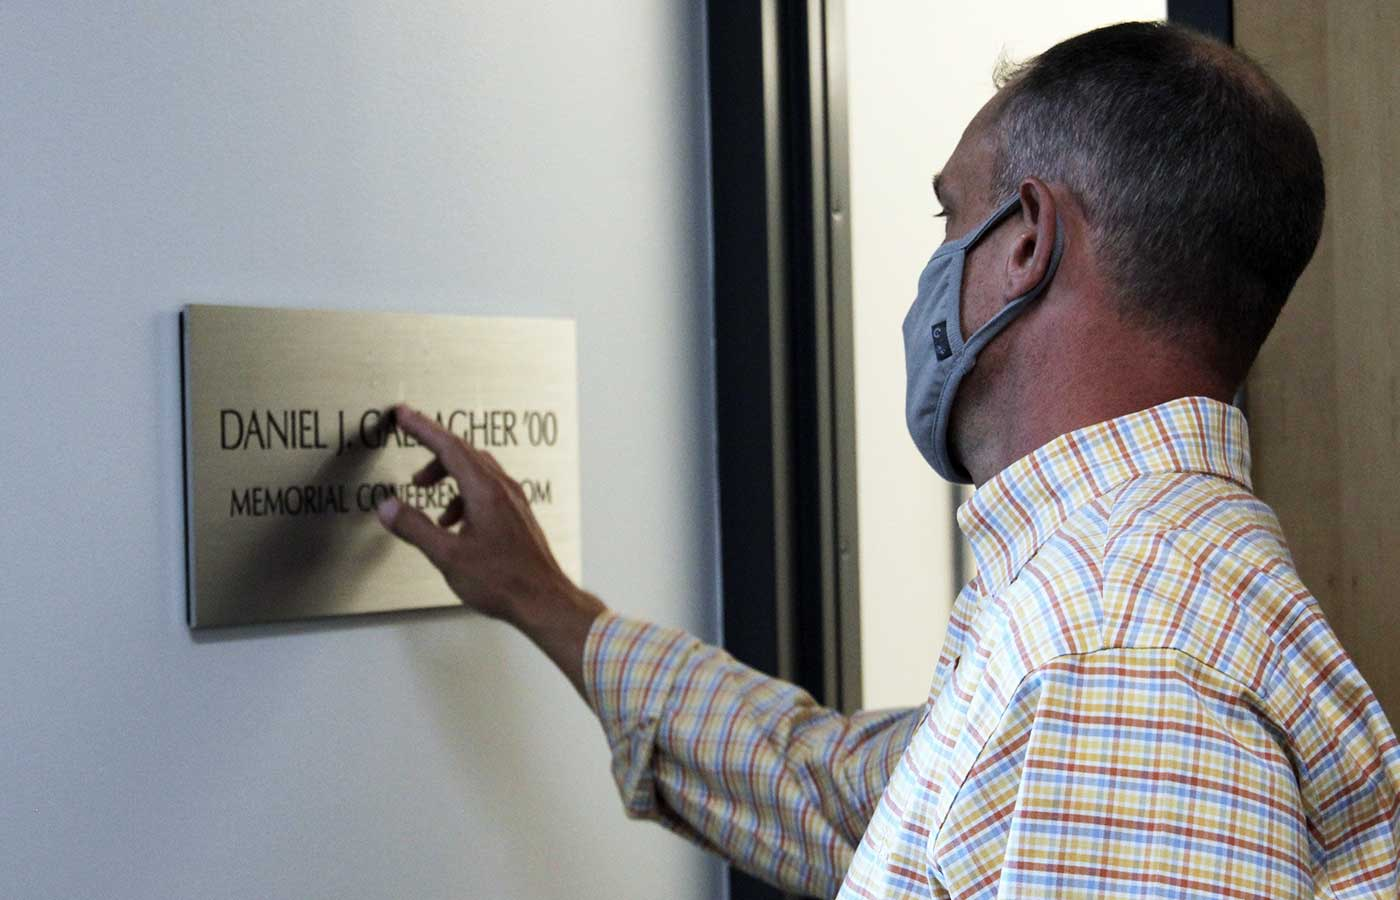 daniel gallagher memorial room dedication